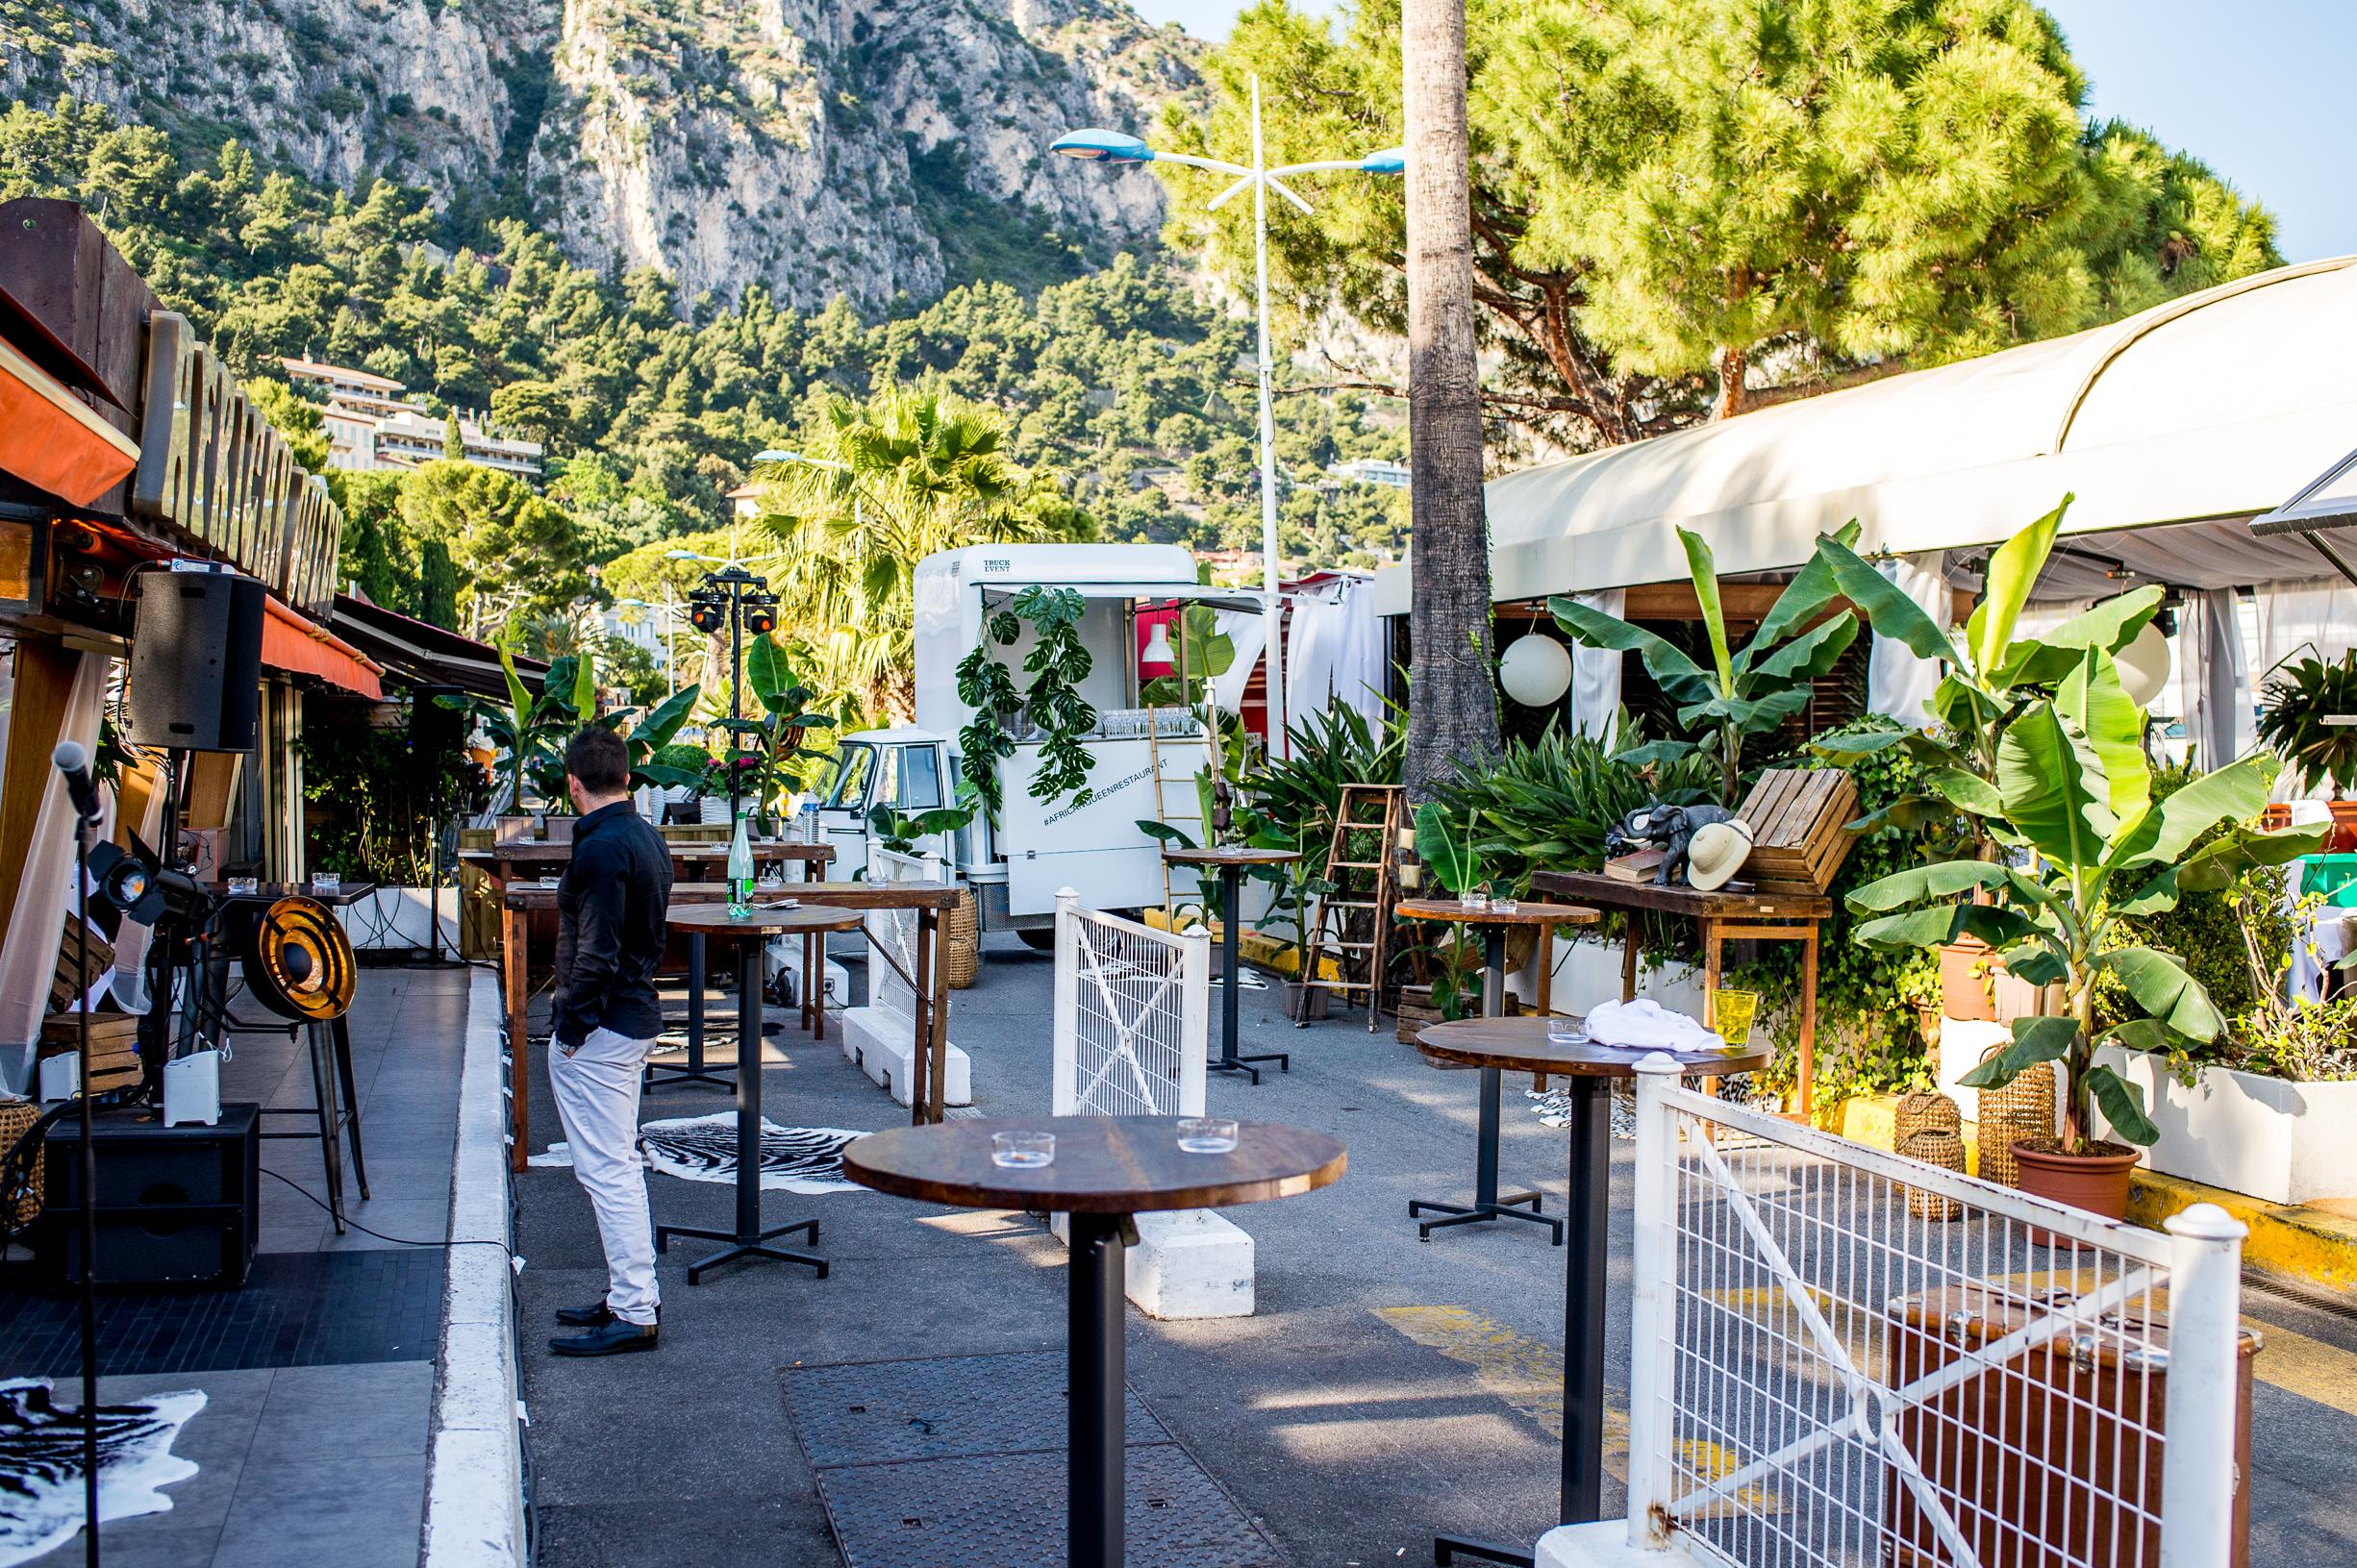 Food Truck Cote d'Azur